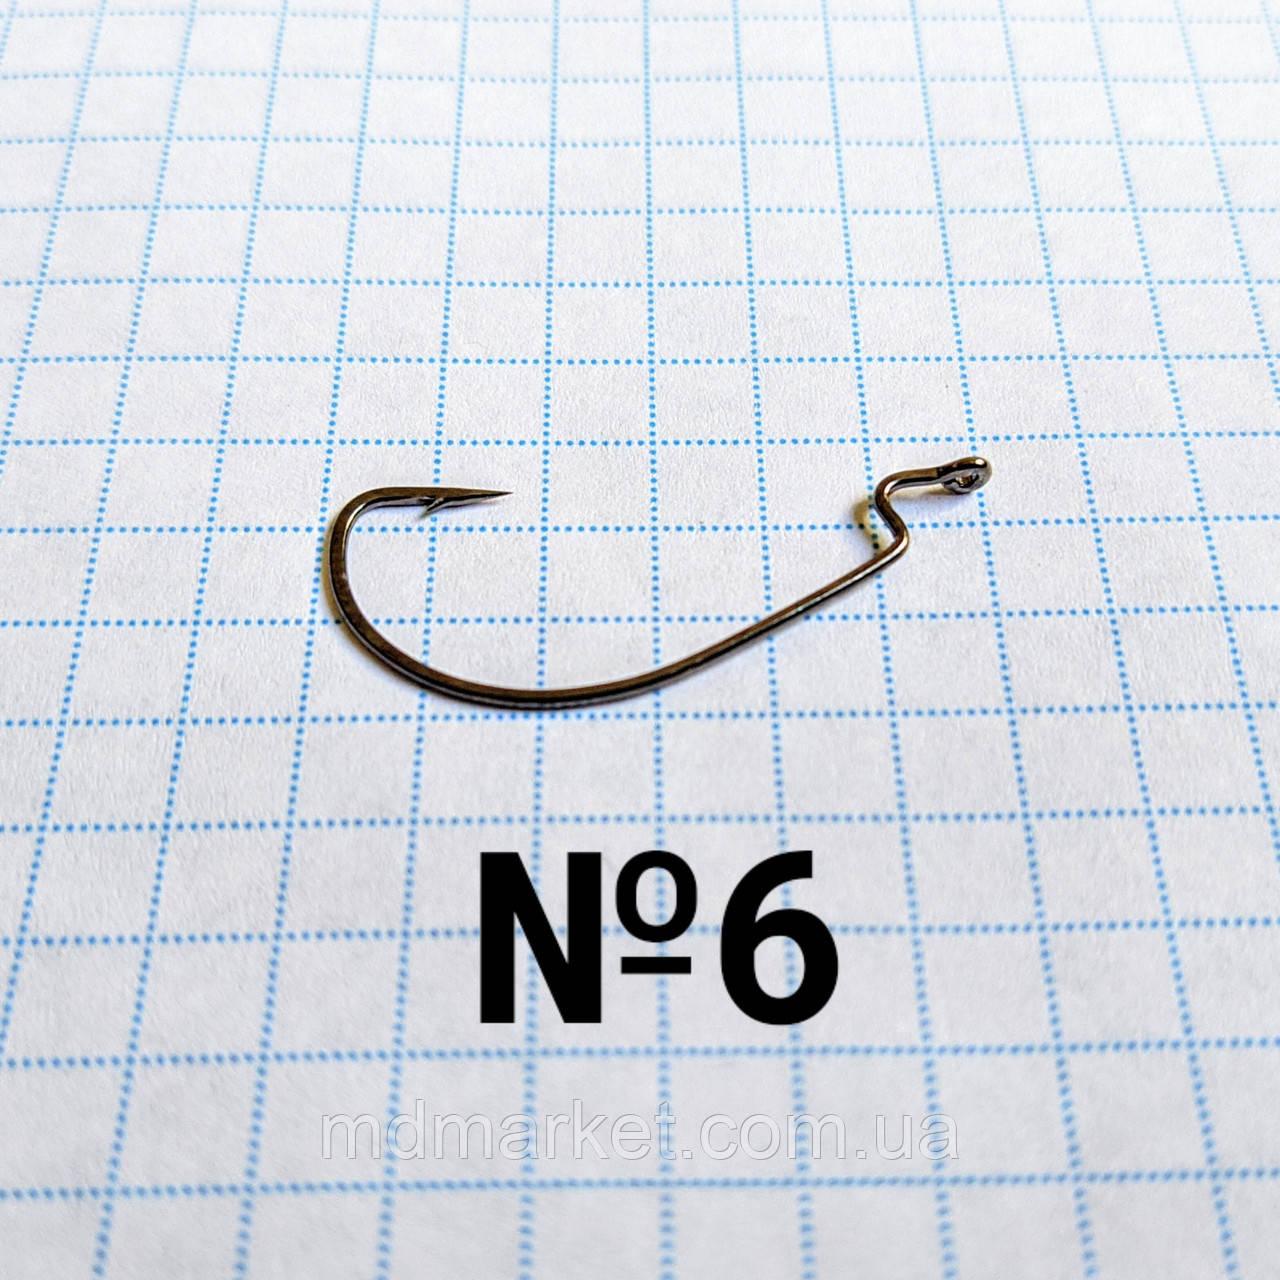 Офсетный крючок №6 Kumho (50шт.)